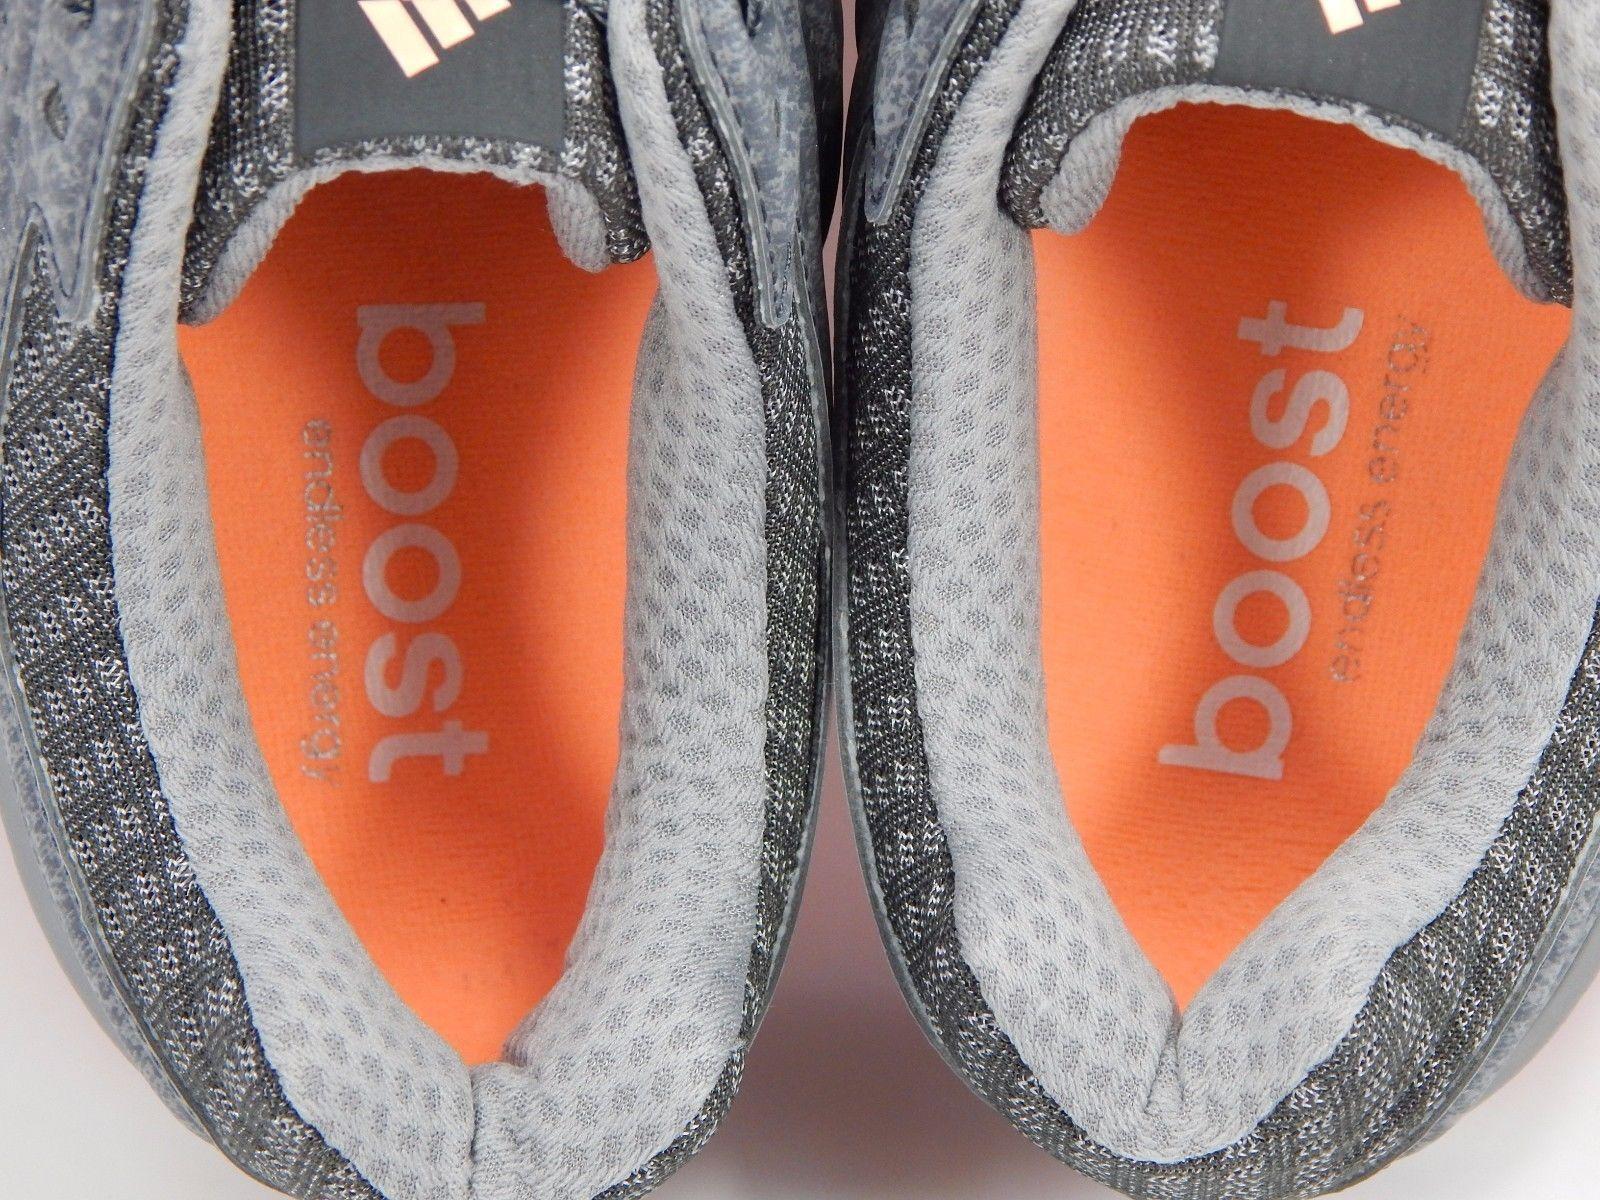 Adidas Supernova Sequence 8 Women's Running Shoes Size US 11.5 M (B) EU 44 2/3